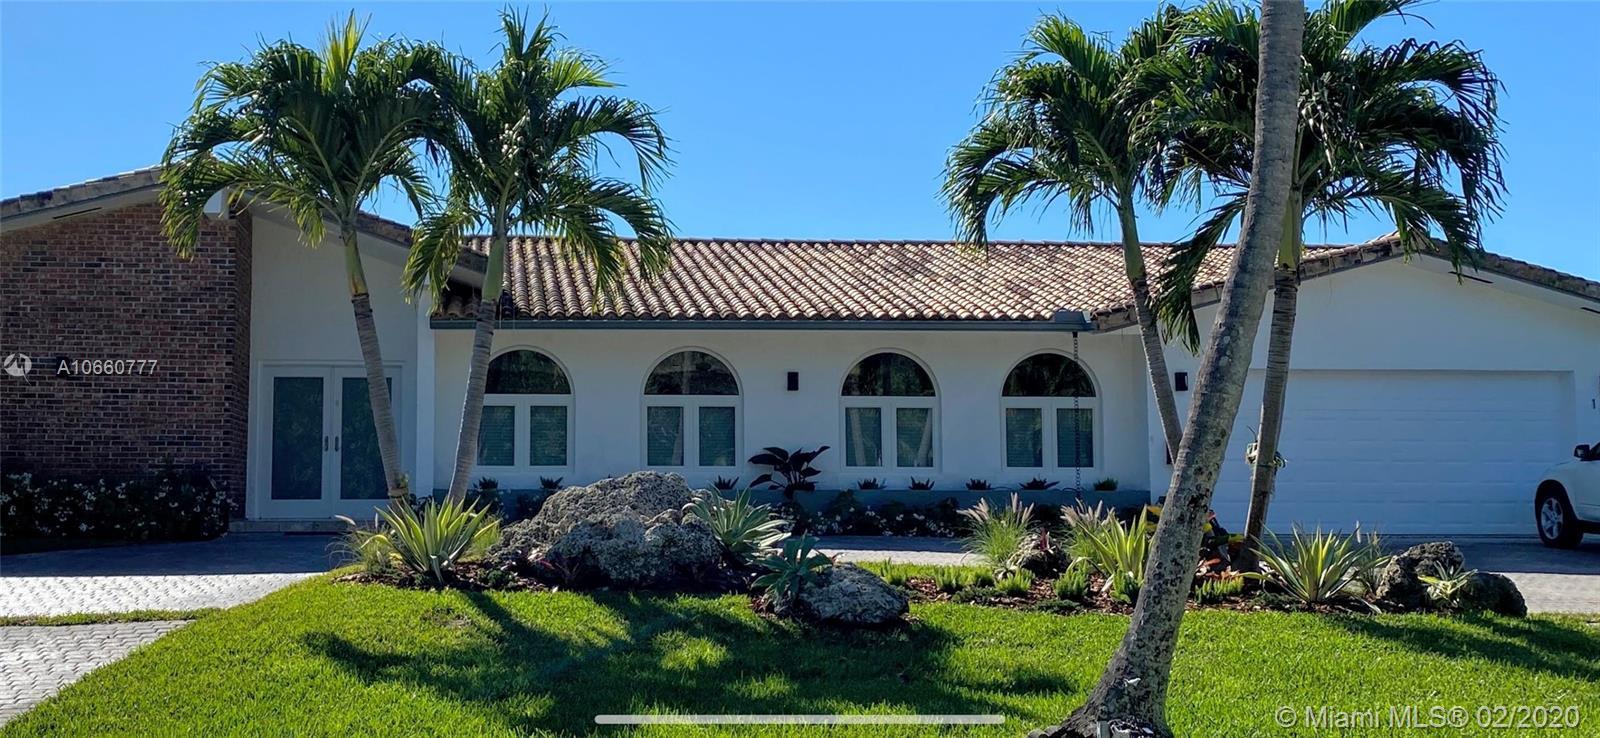 1036  Lugo Ave  For Sale A10660777, FL